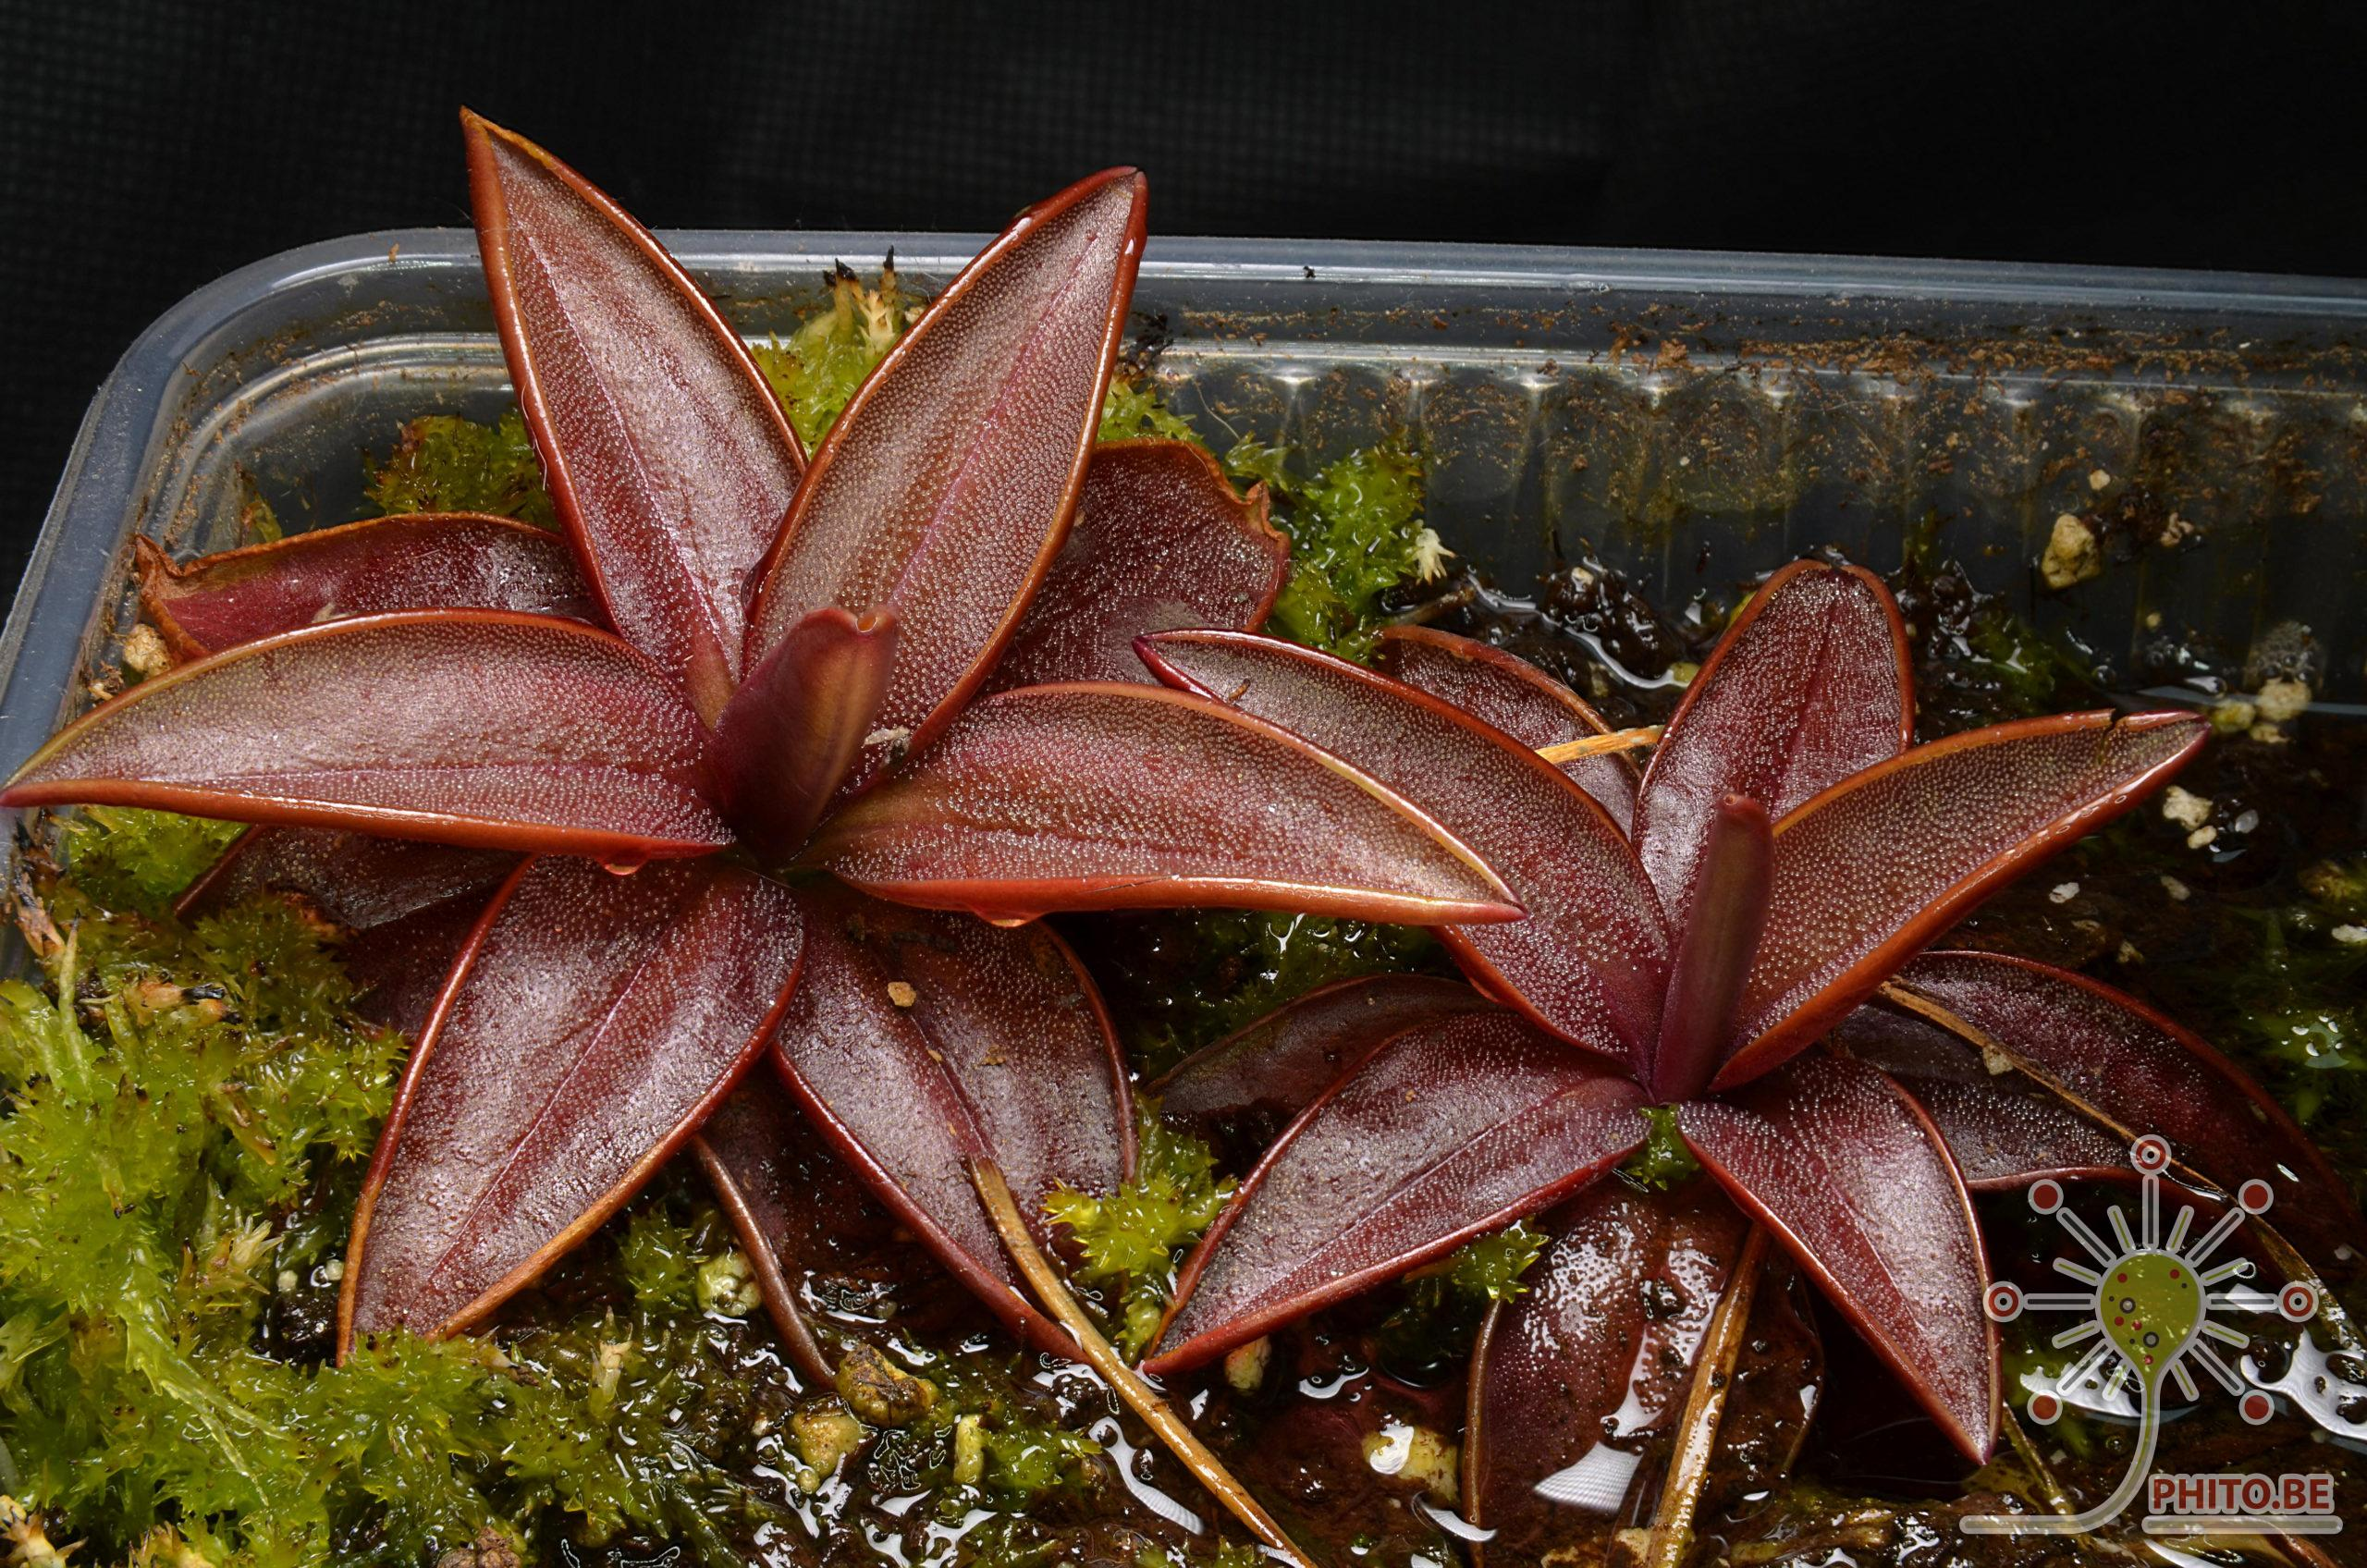 Pinguicula planifolia adultes à vendre 2020-07-16-17.00.03-ZS-DMap-scaled